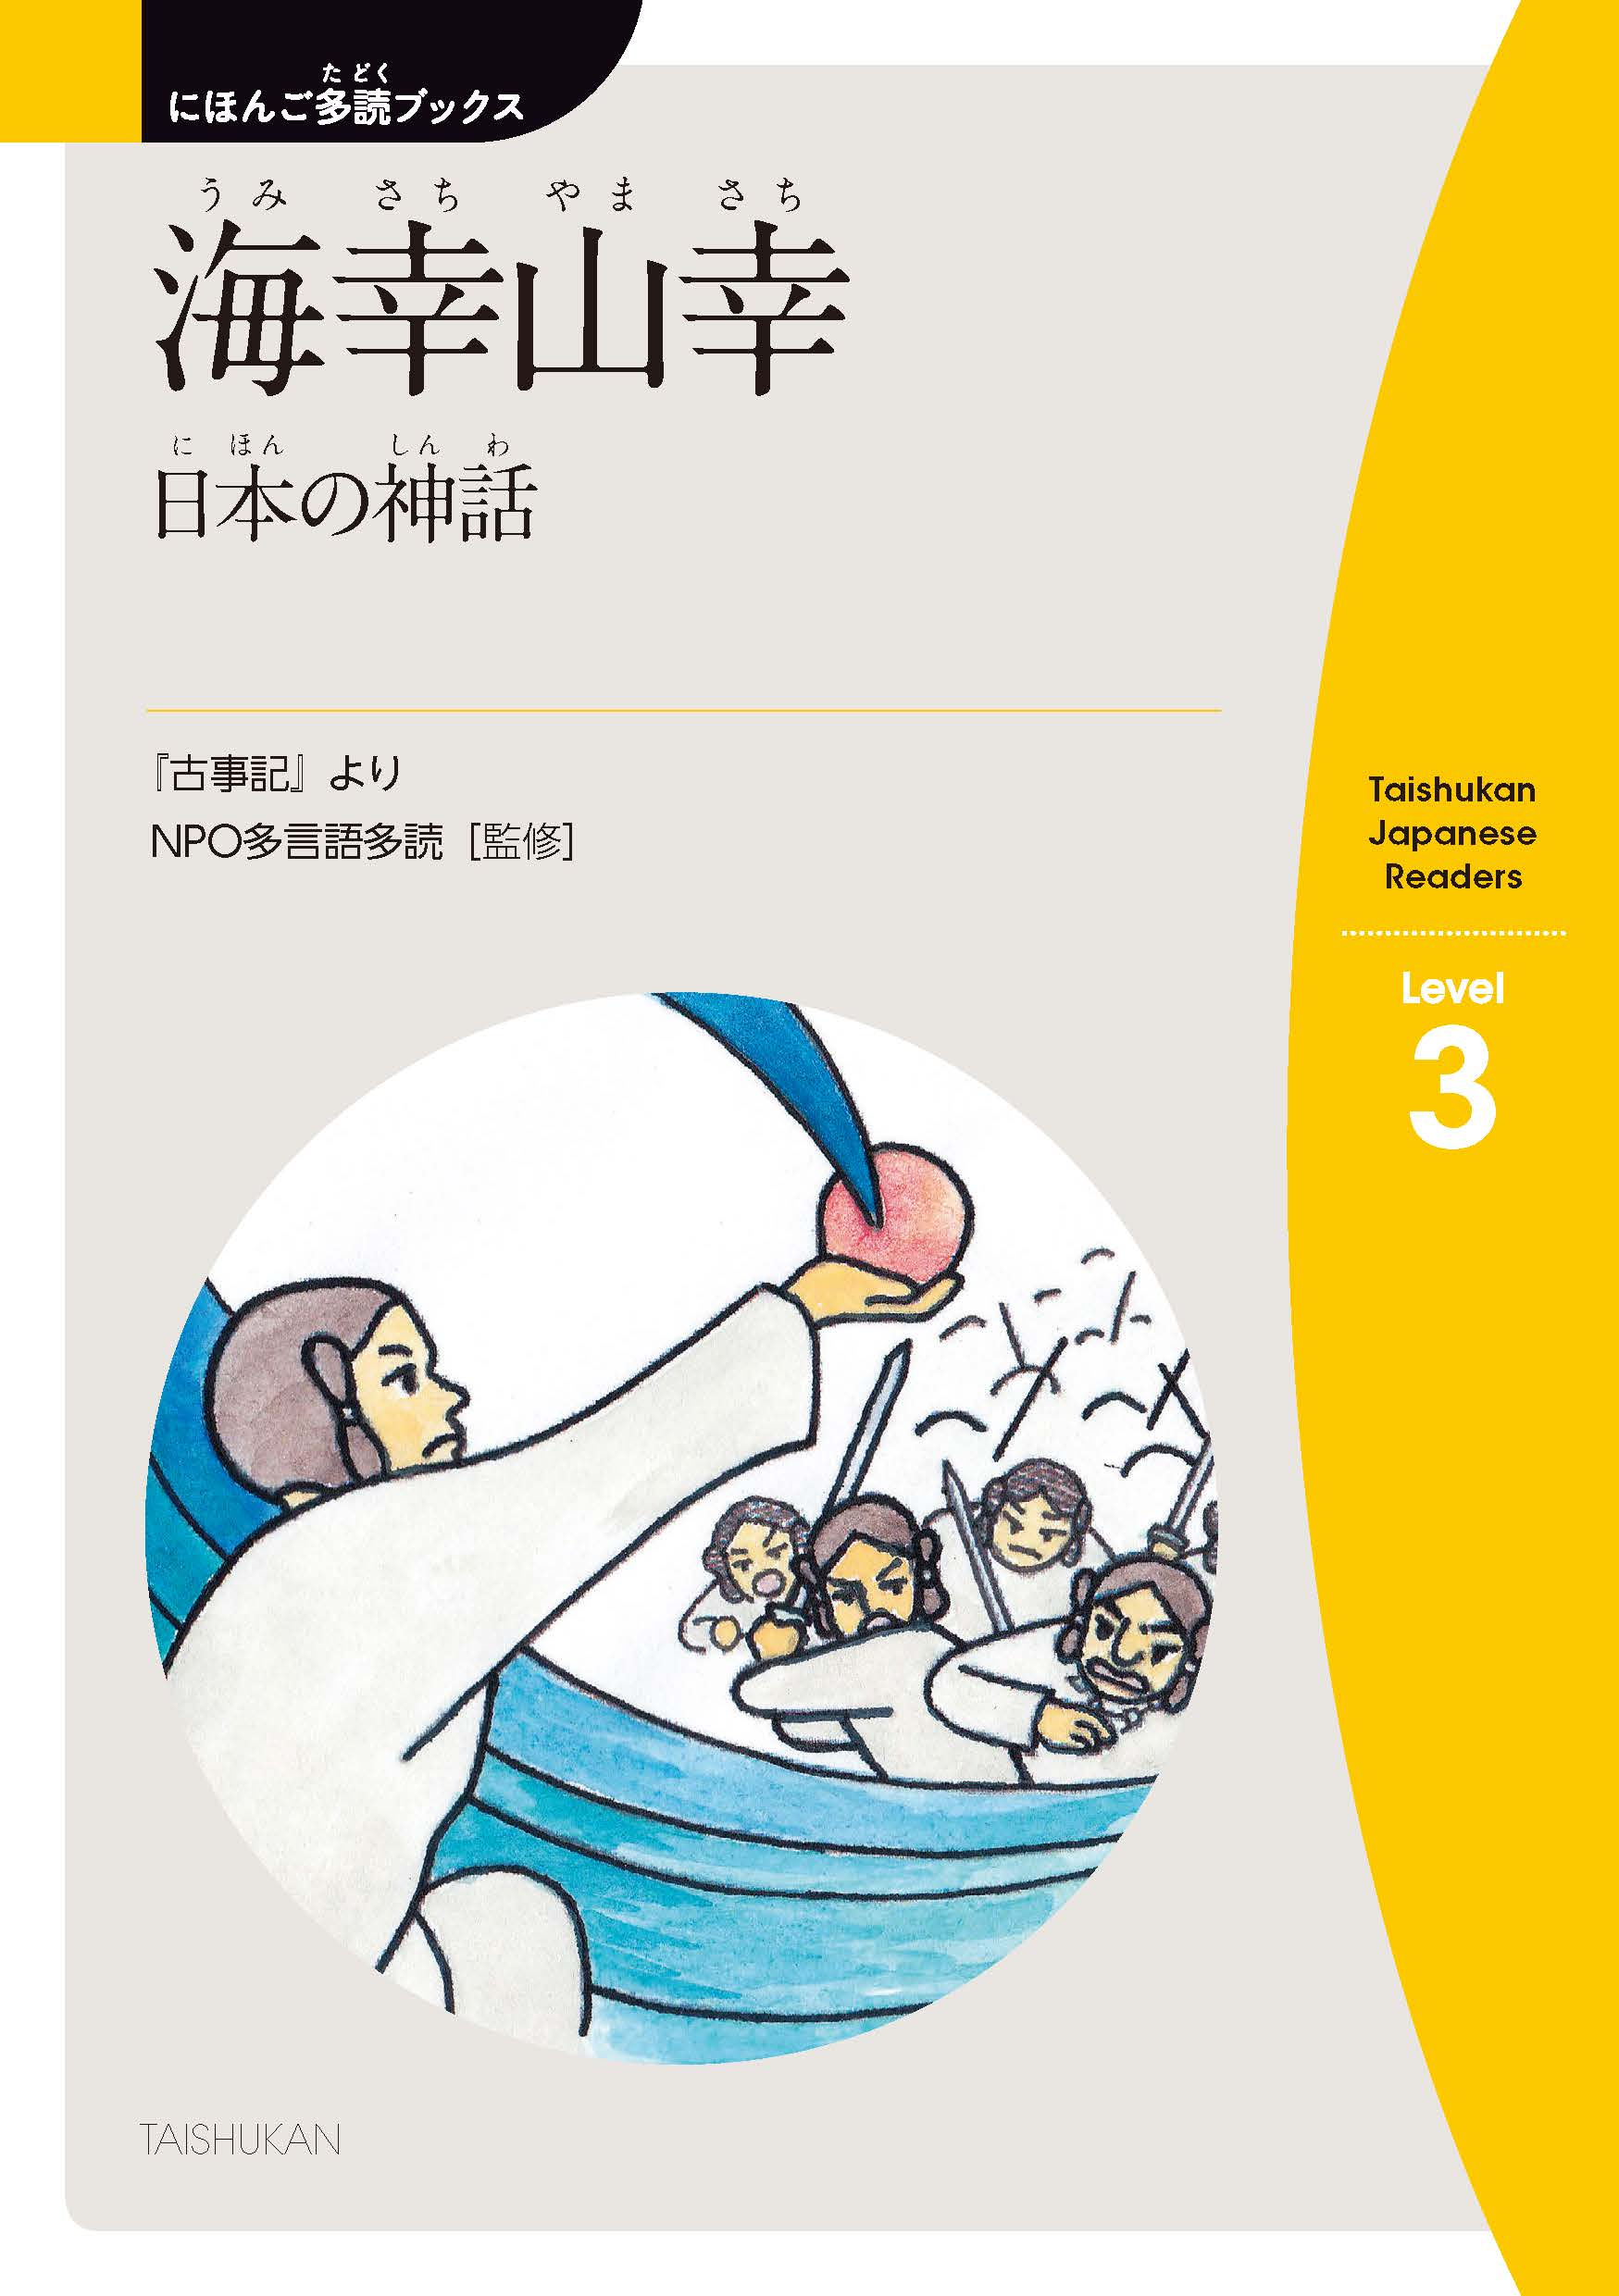 vol.3-4 日本(にほん)の神話(しんわ)「海幸山幸(うみさちやまさち)」 Sea Prince and Mountain Prince